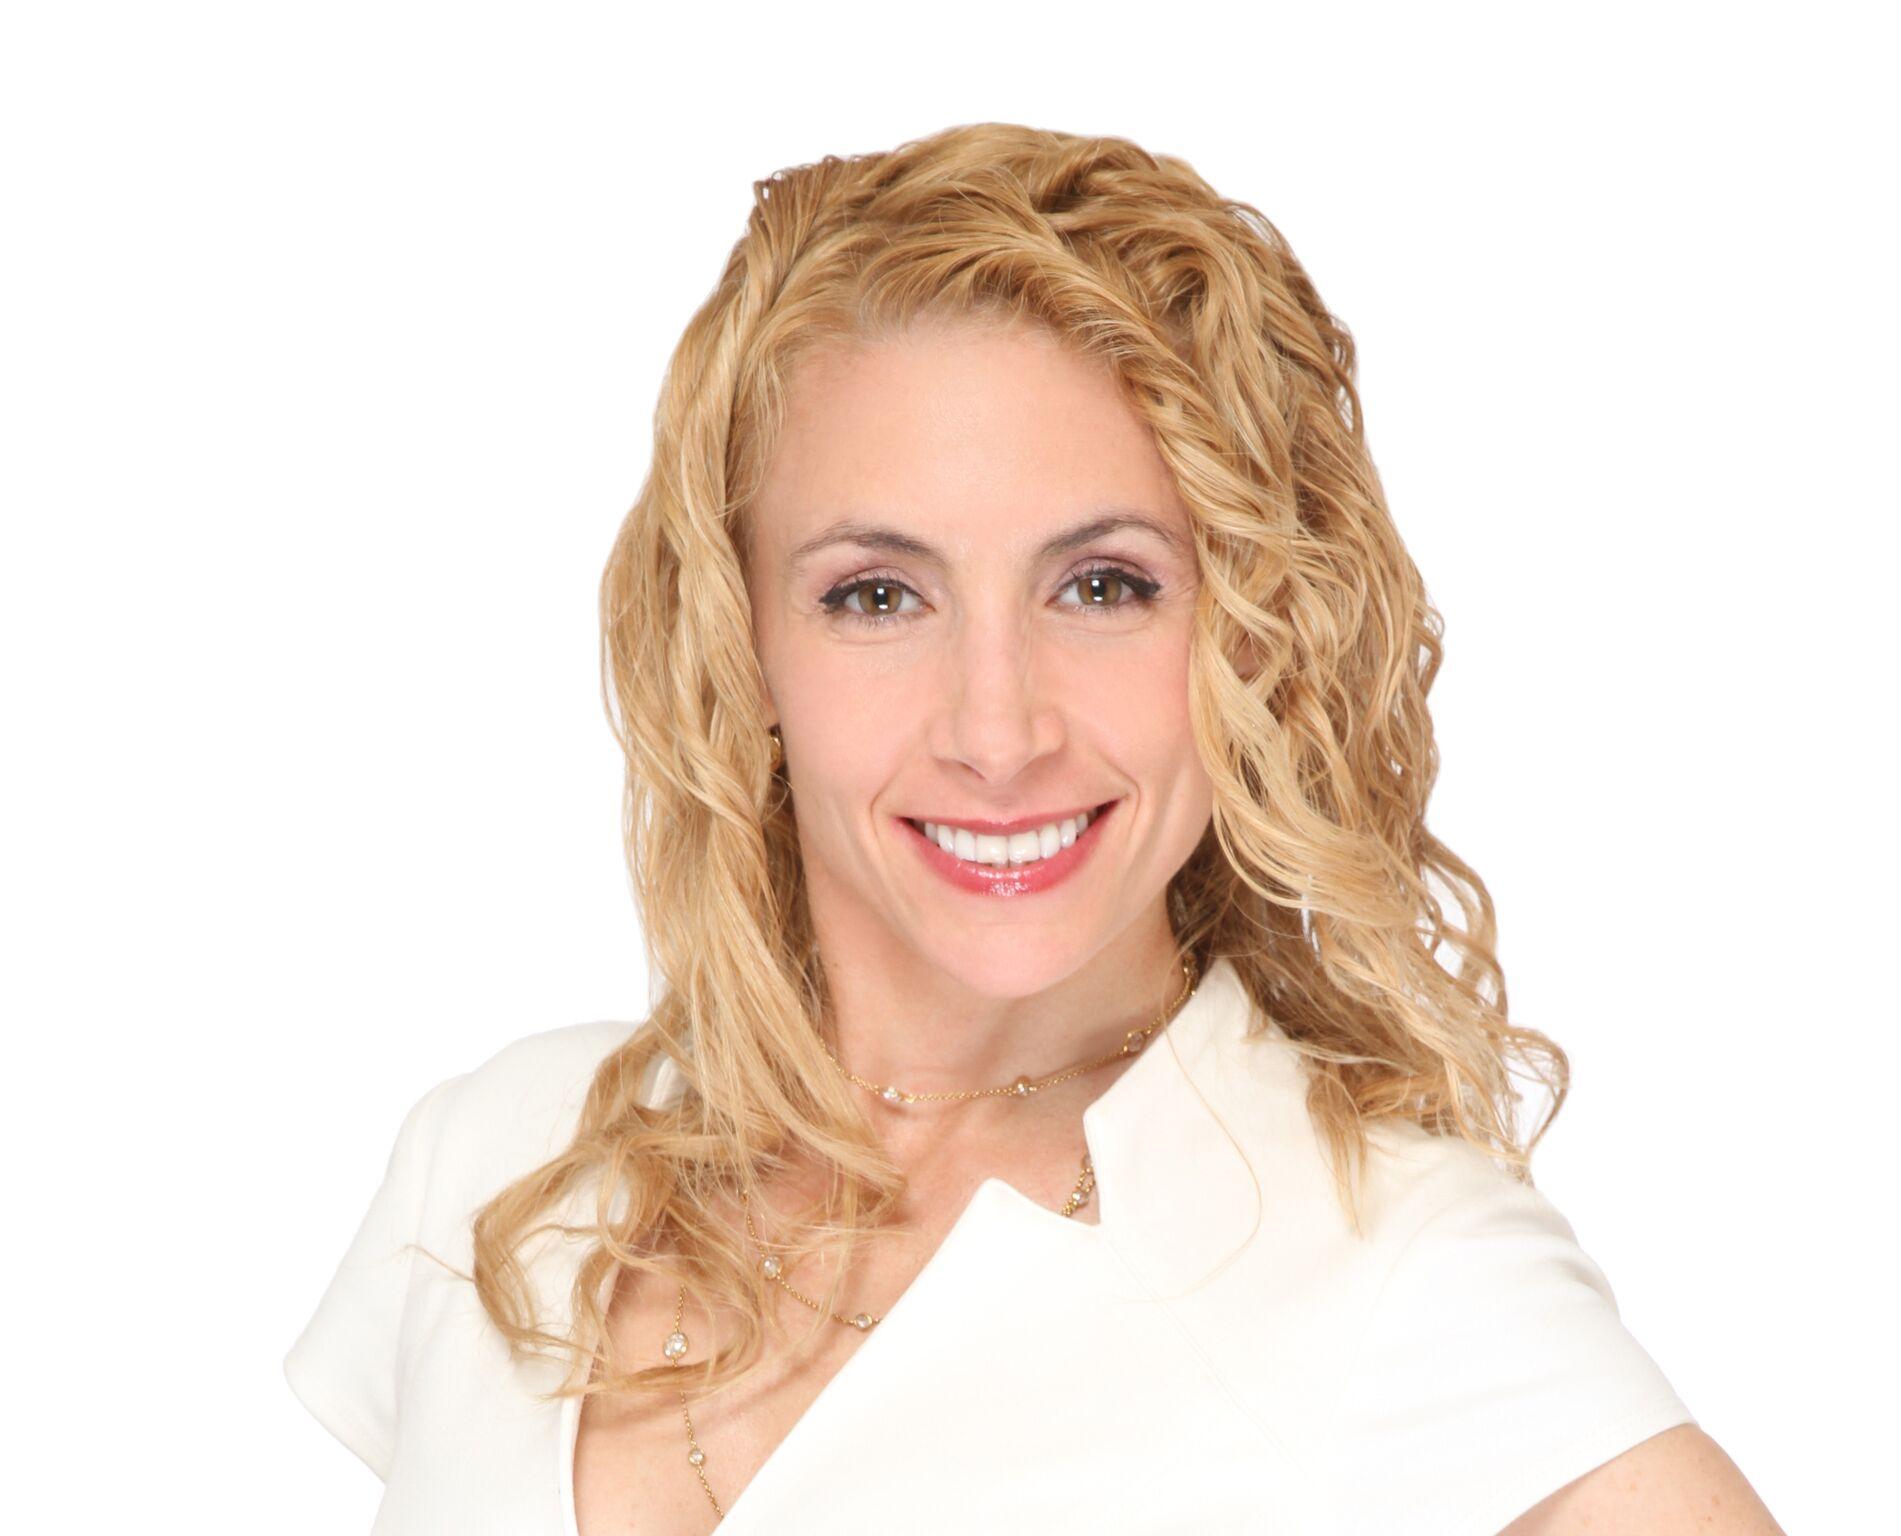 Robin Farmanfarmaian - Medical futurist, entrepreneur, and bestselling author